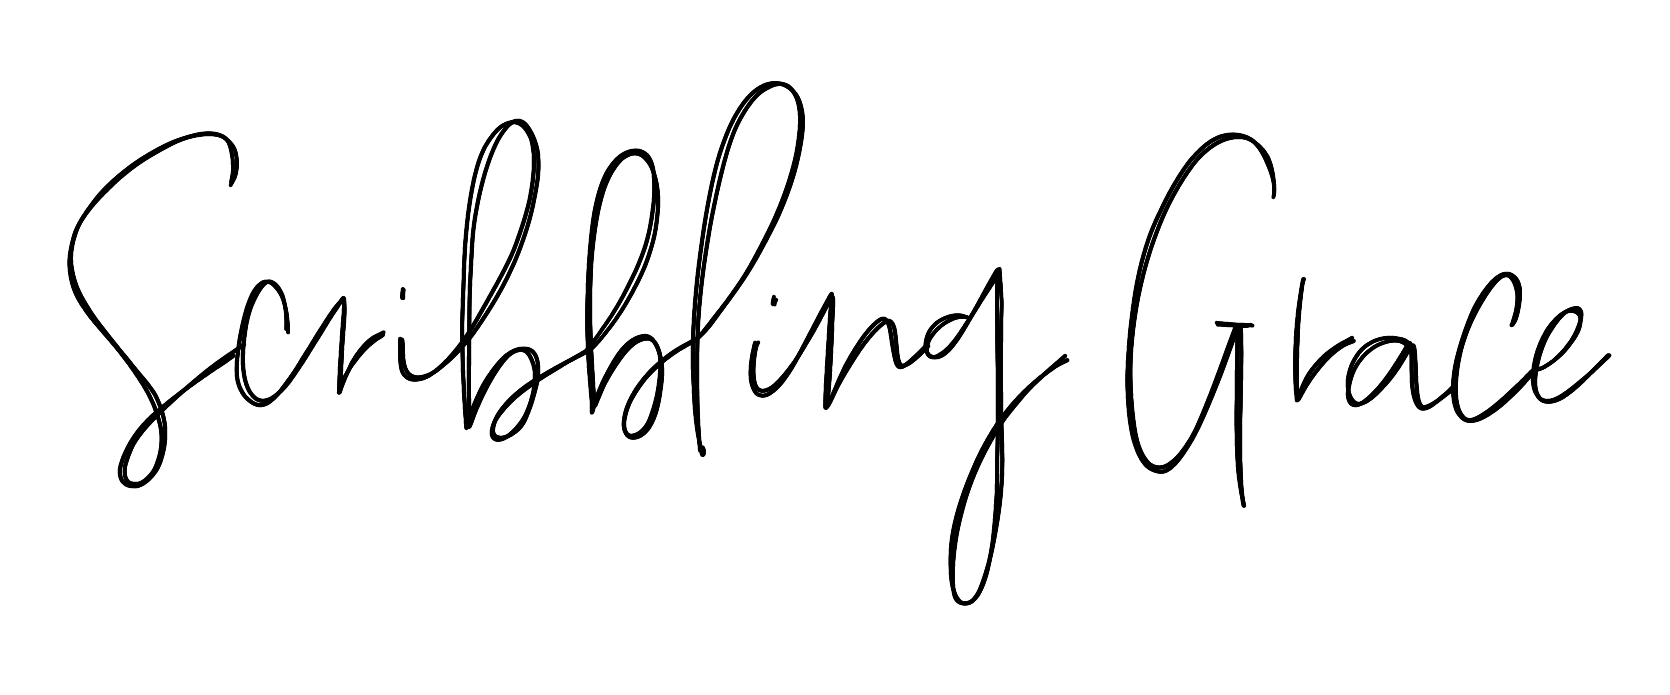 Brush Pen Calligraphy Basics- Plus Free Printable Practice Sheets - Calligraphy Practice Sheets Printable Free